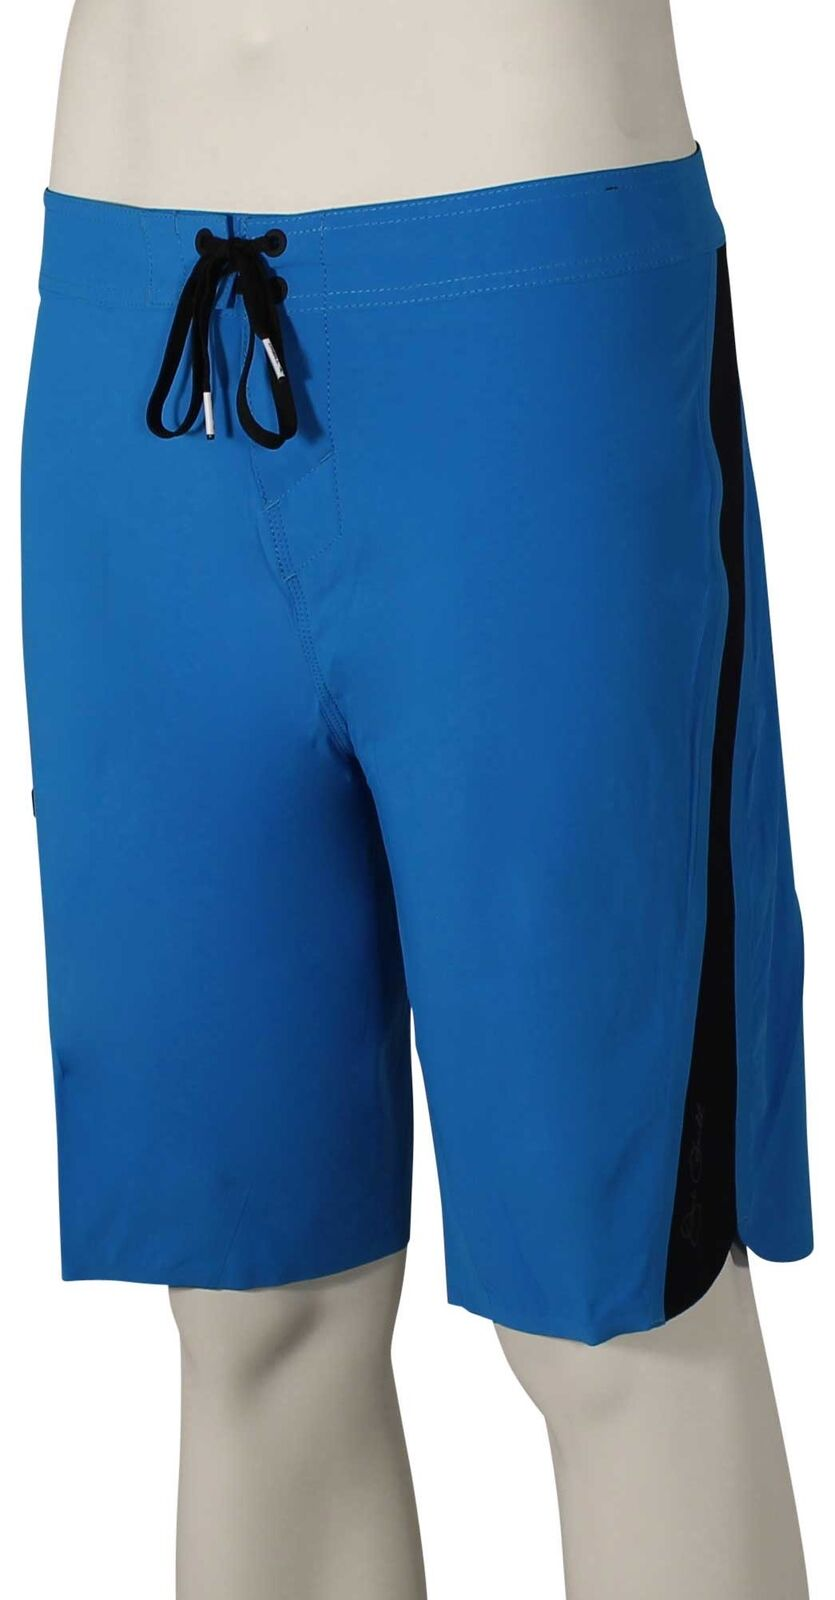 O'Neill Superfreak Paddler Boardshorts - Cobalt - New